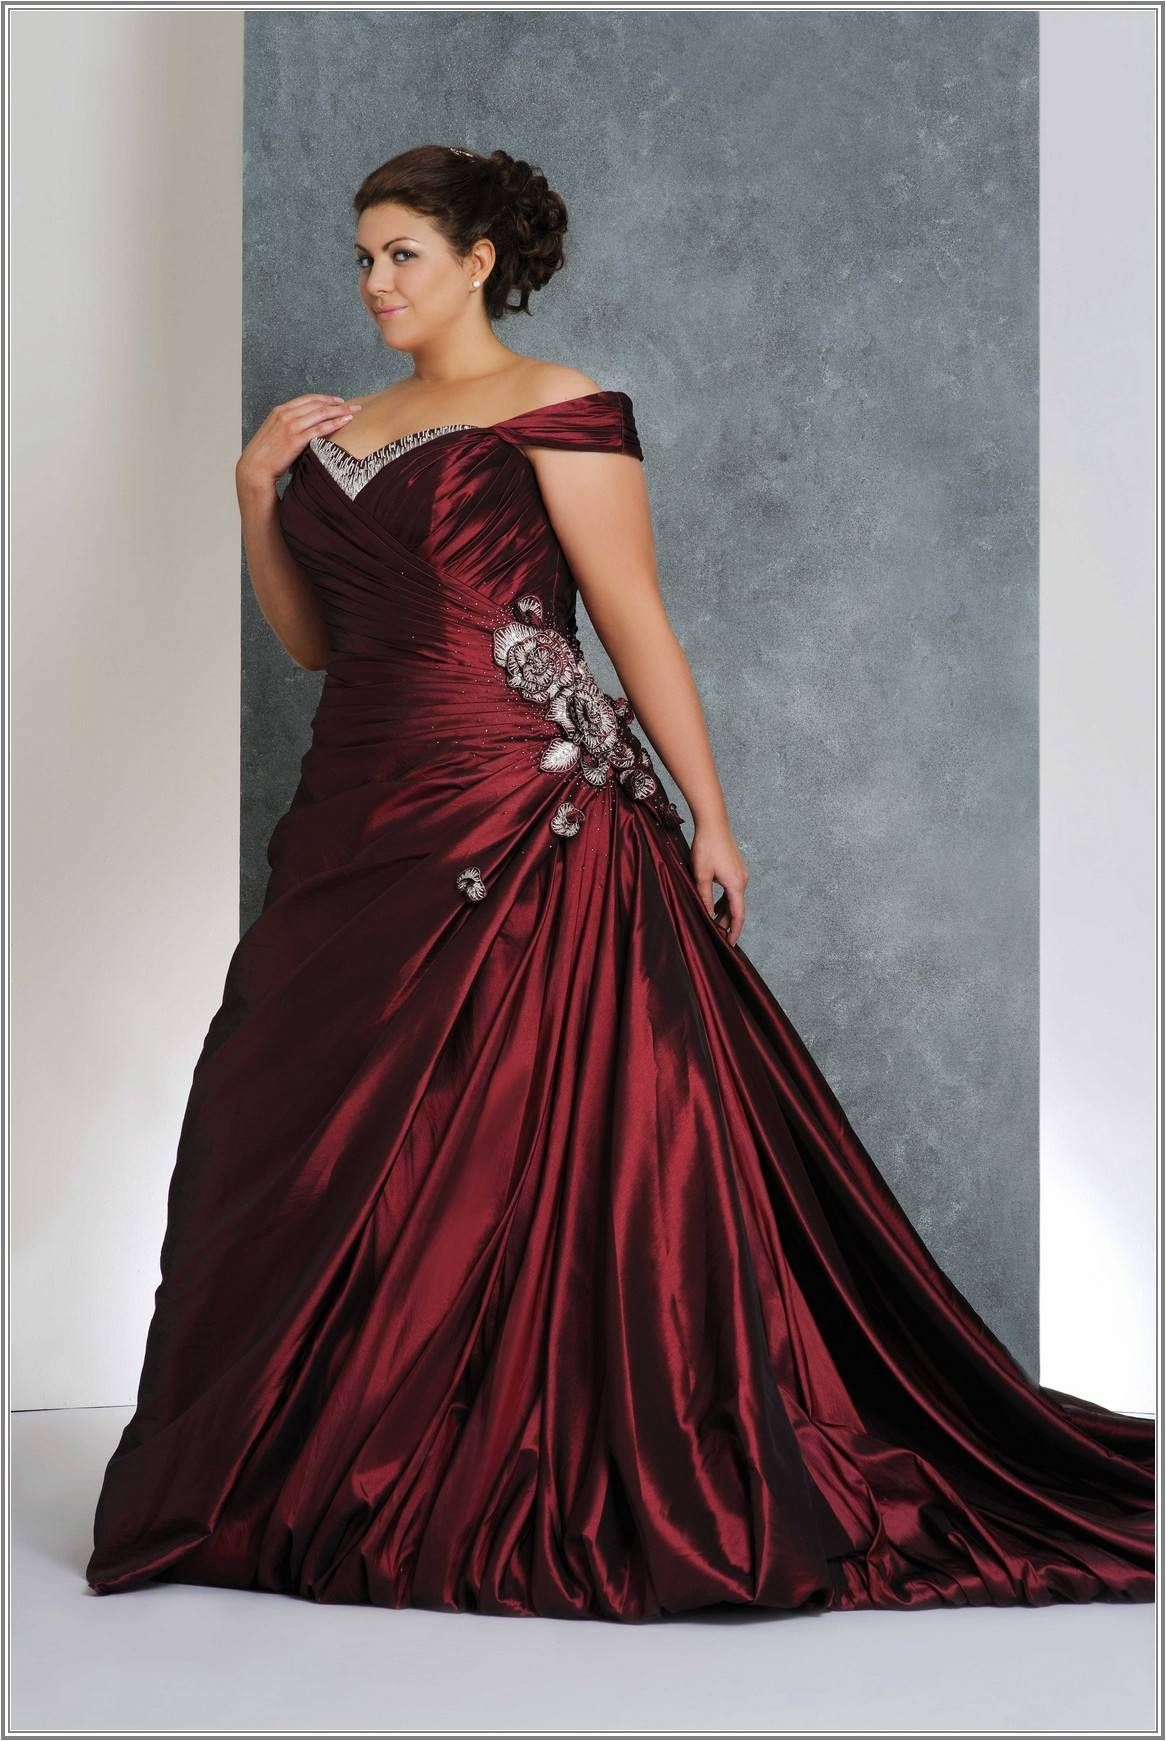 Wedding Make You Feel Like A Princess By Wearing Wedding Dresses With Bling Plus Size Wedd Red Wedding Dresses Wedding Dresses Plus Size Purple Wedding Dress